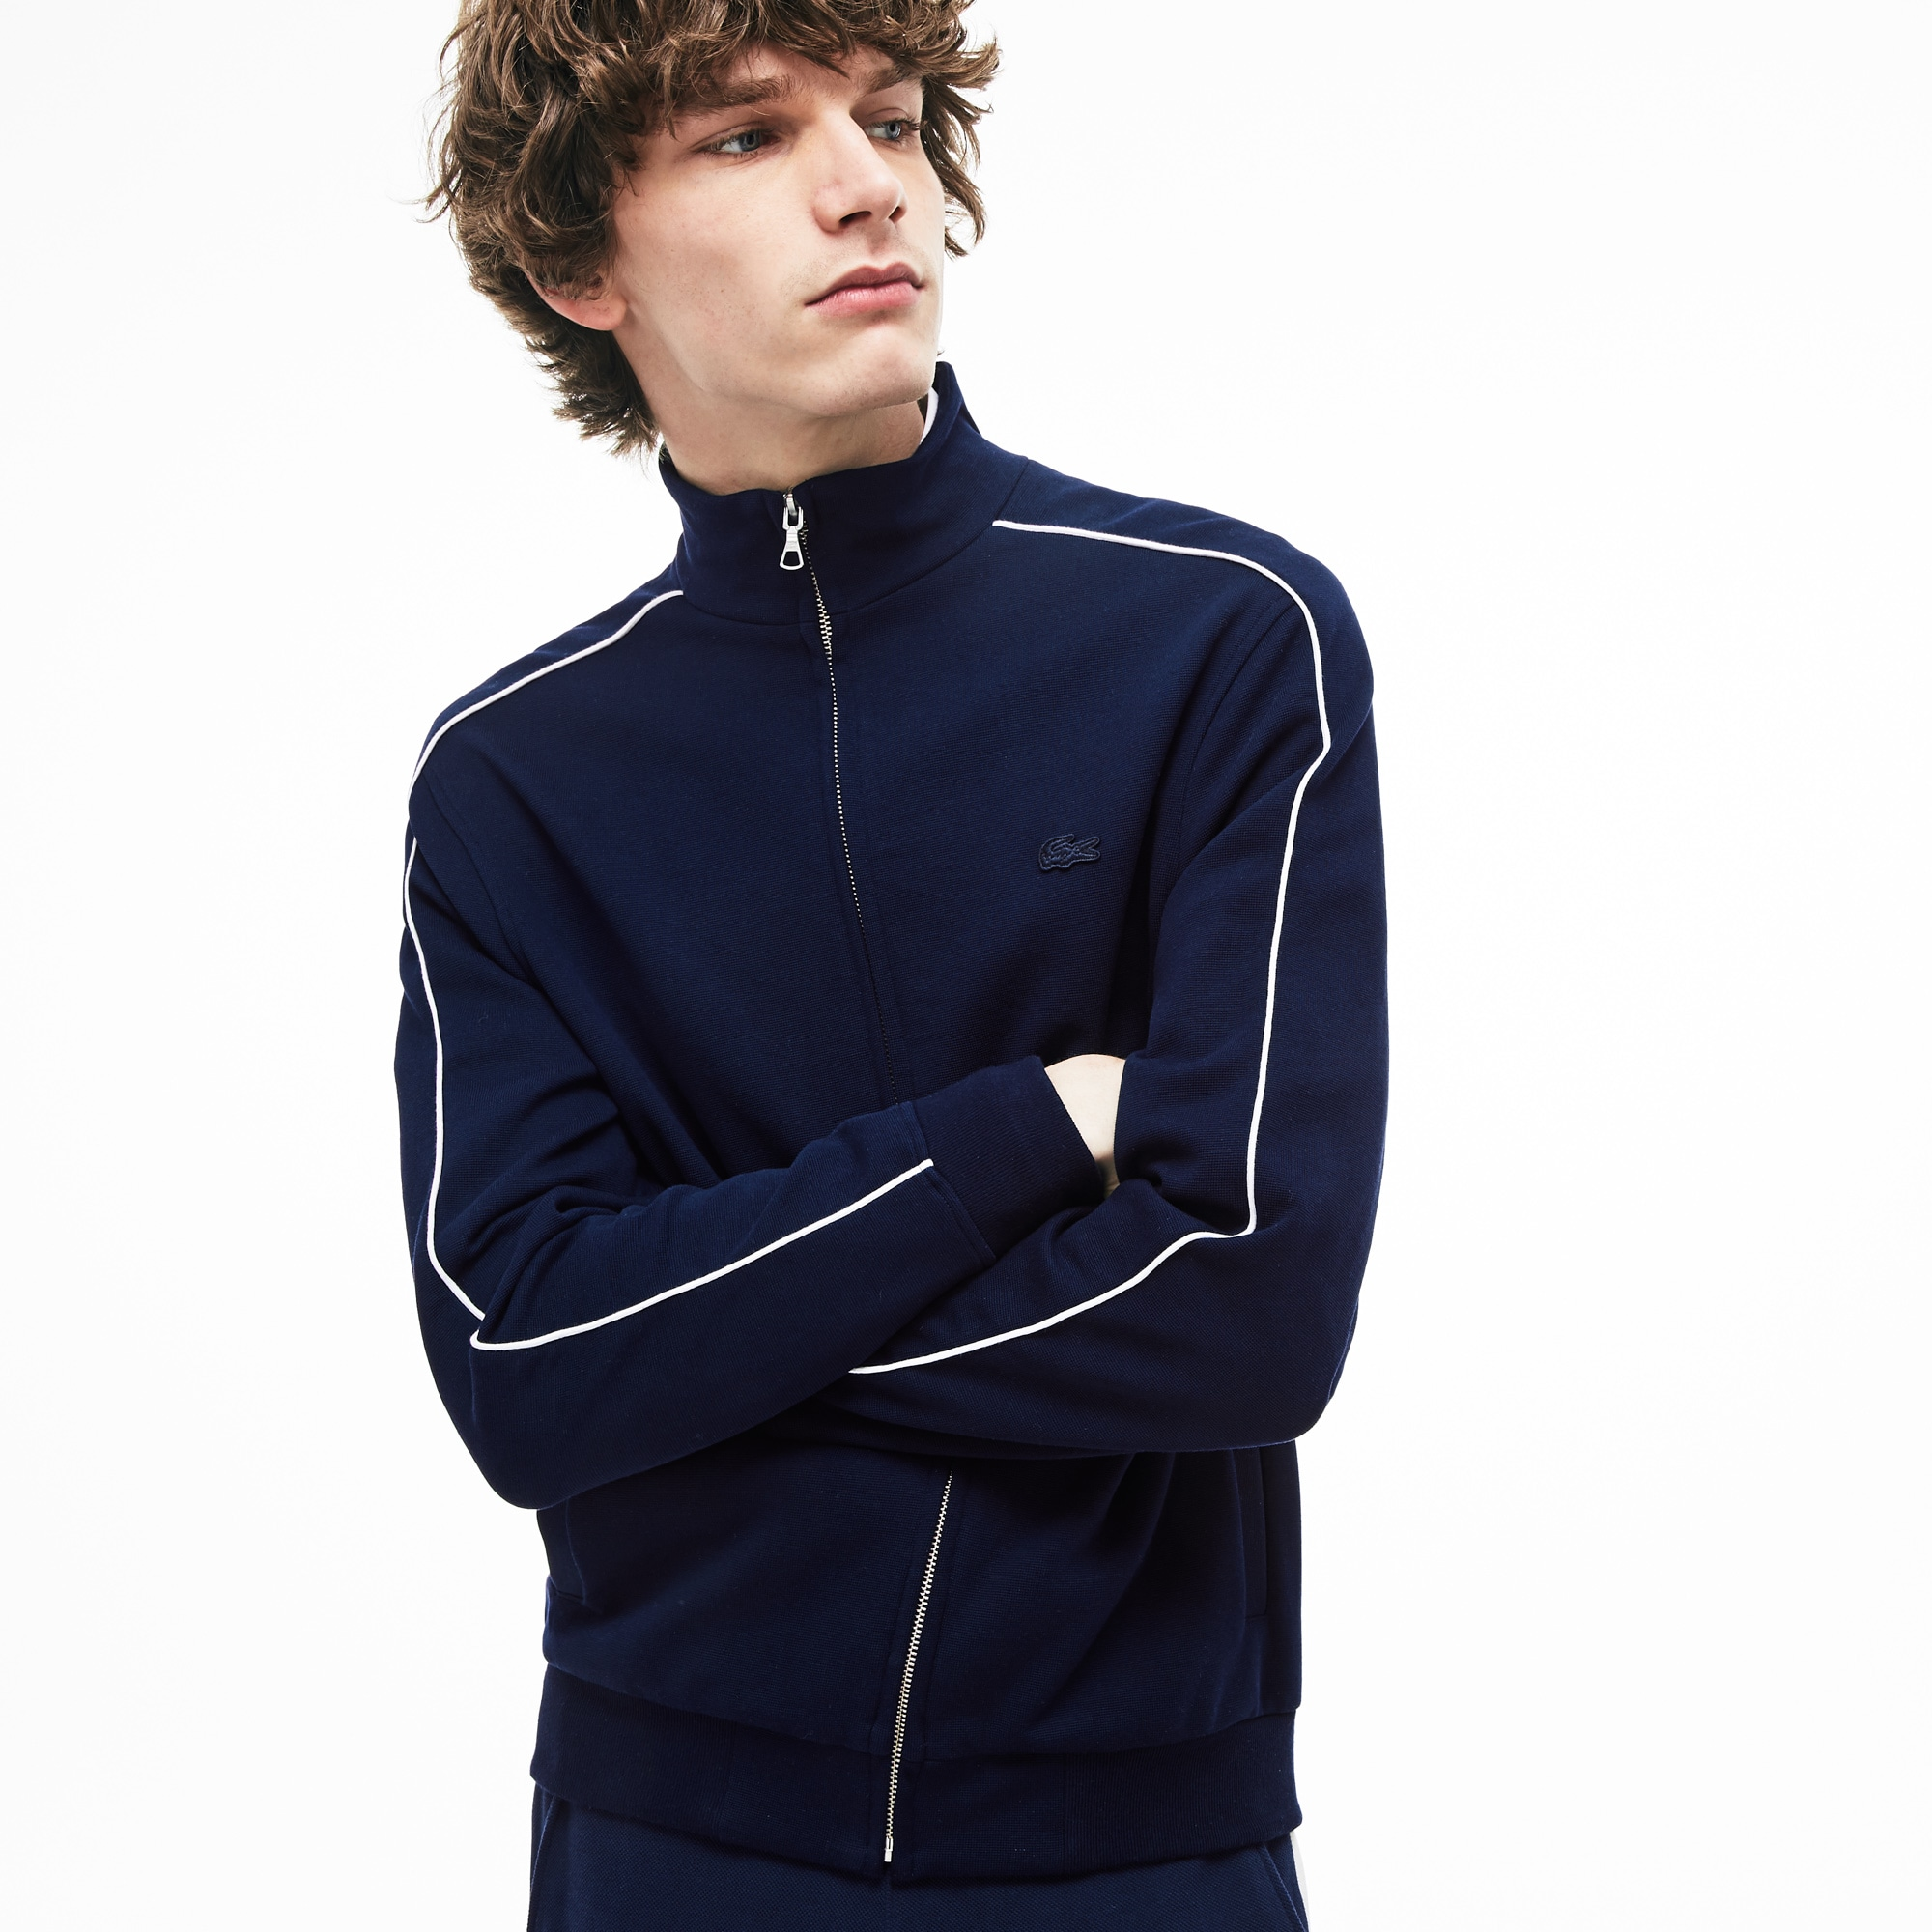 30371642ca Sweatshirt zippé en coton milano avec bandes contrastées